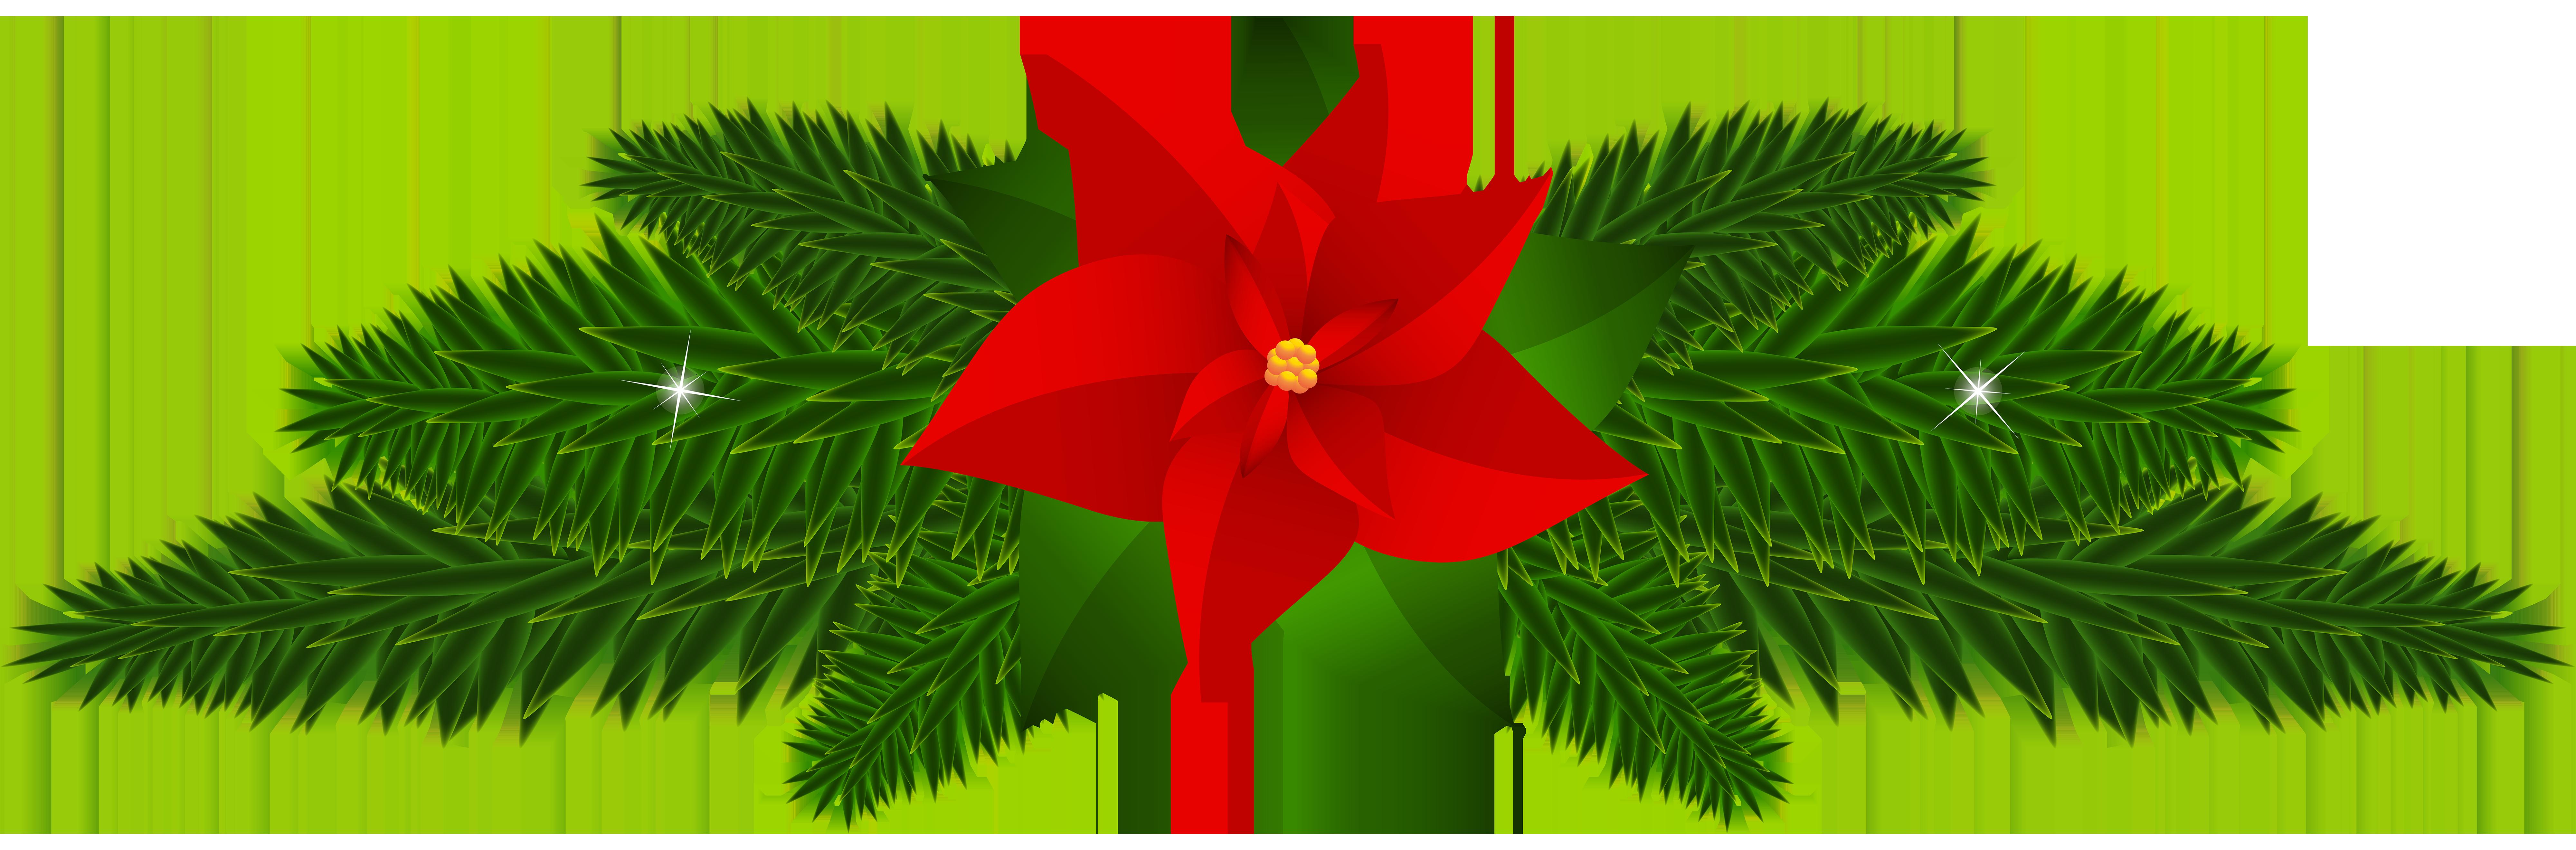 Christmas poinsettia decoration png. Poinsettias clipart ornament